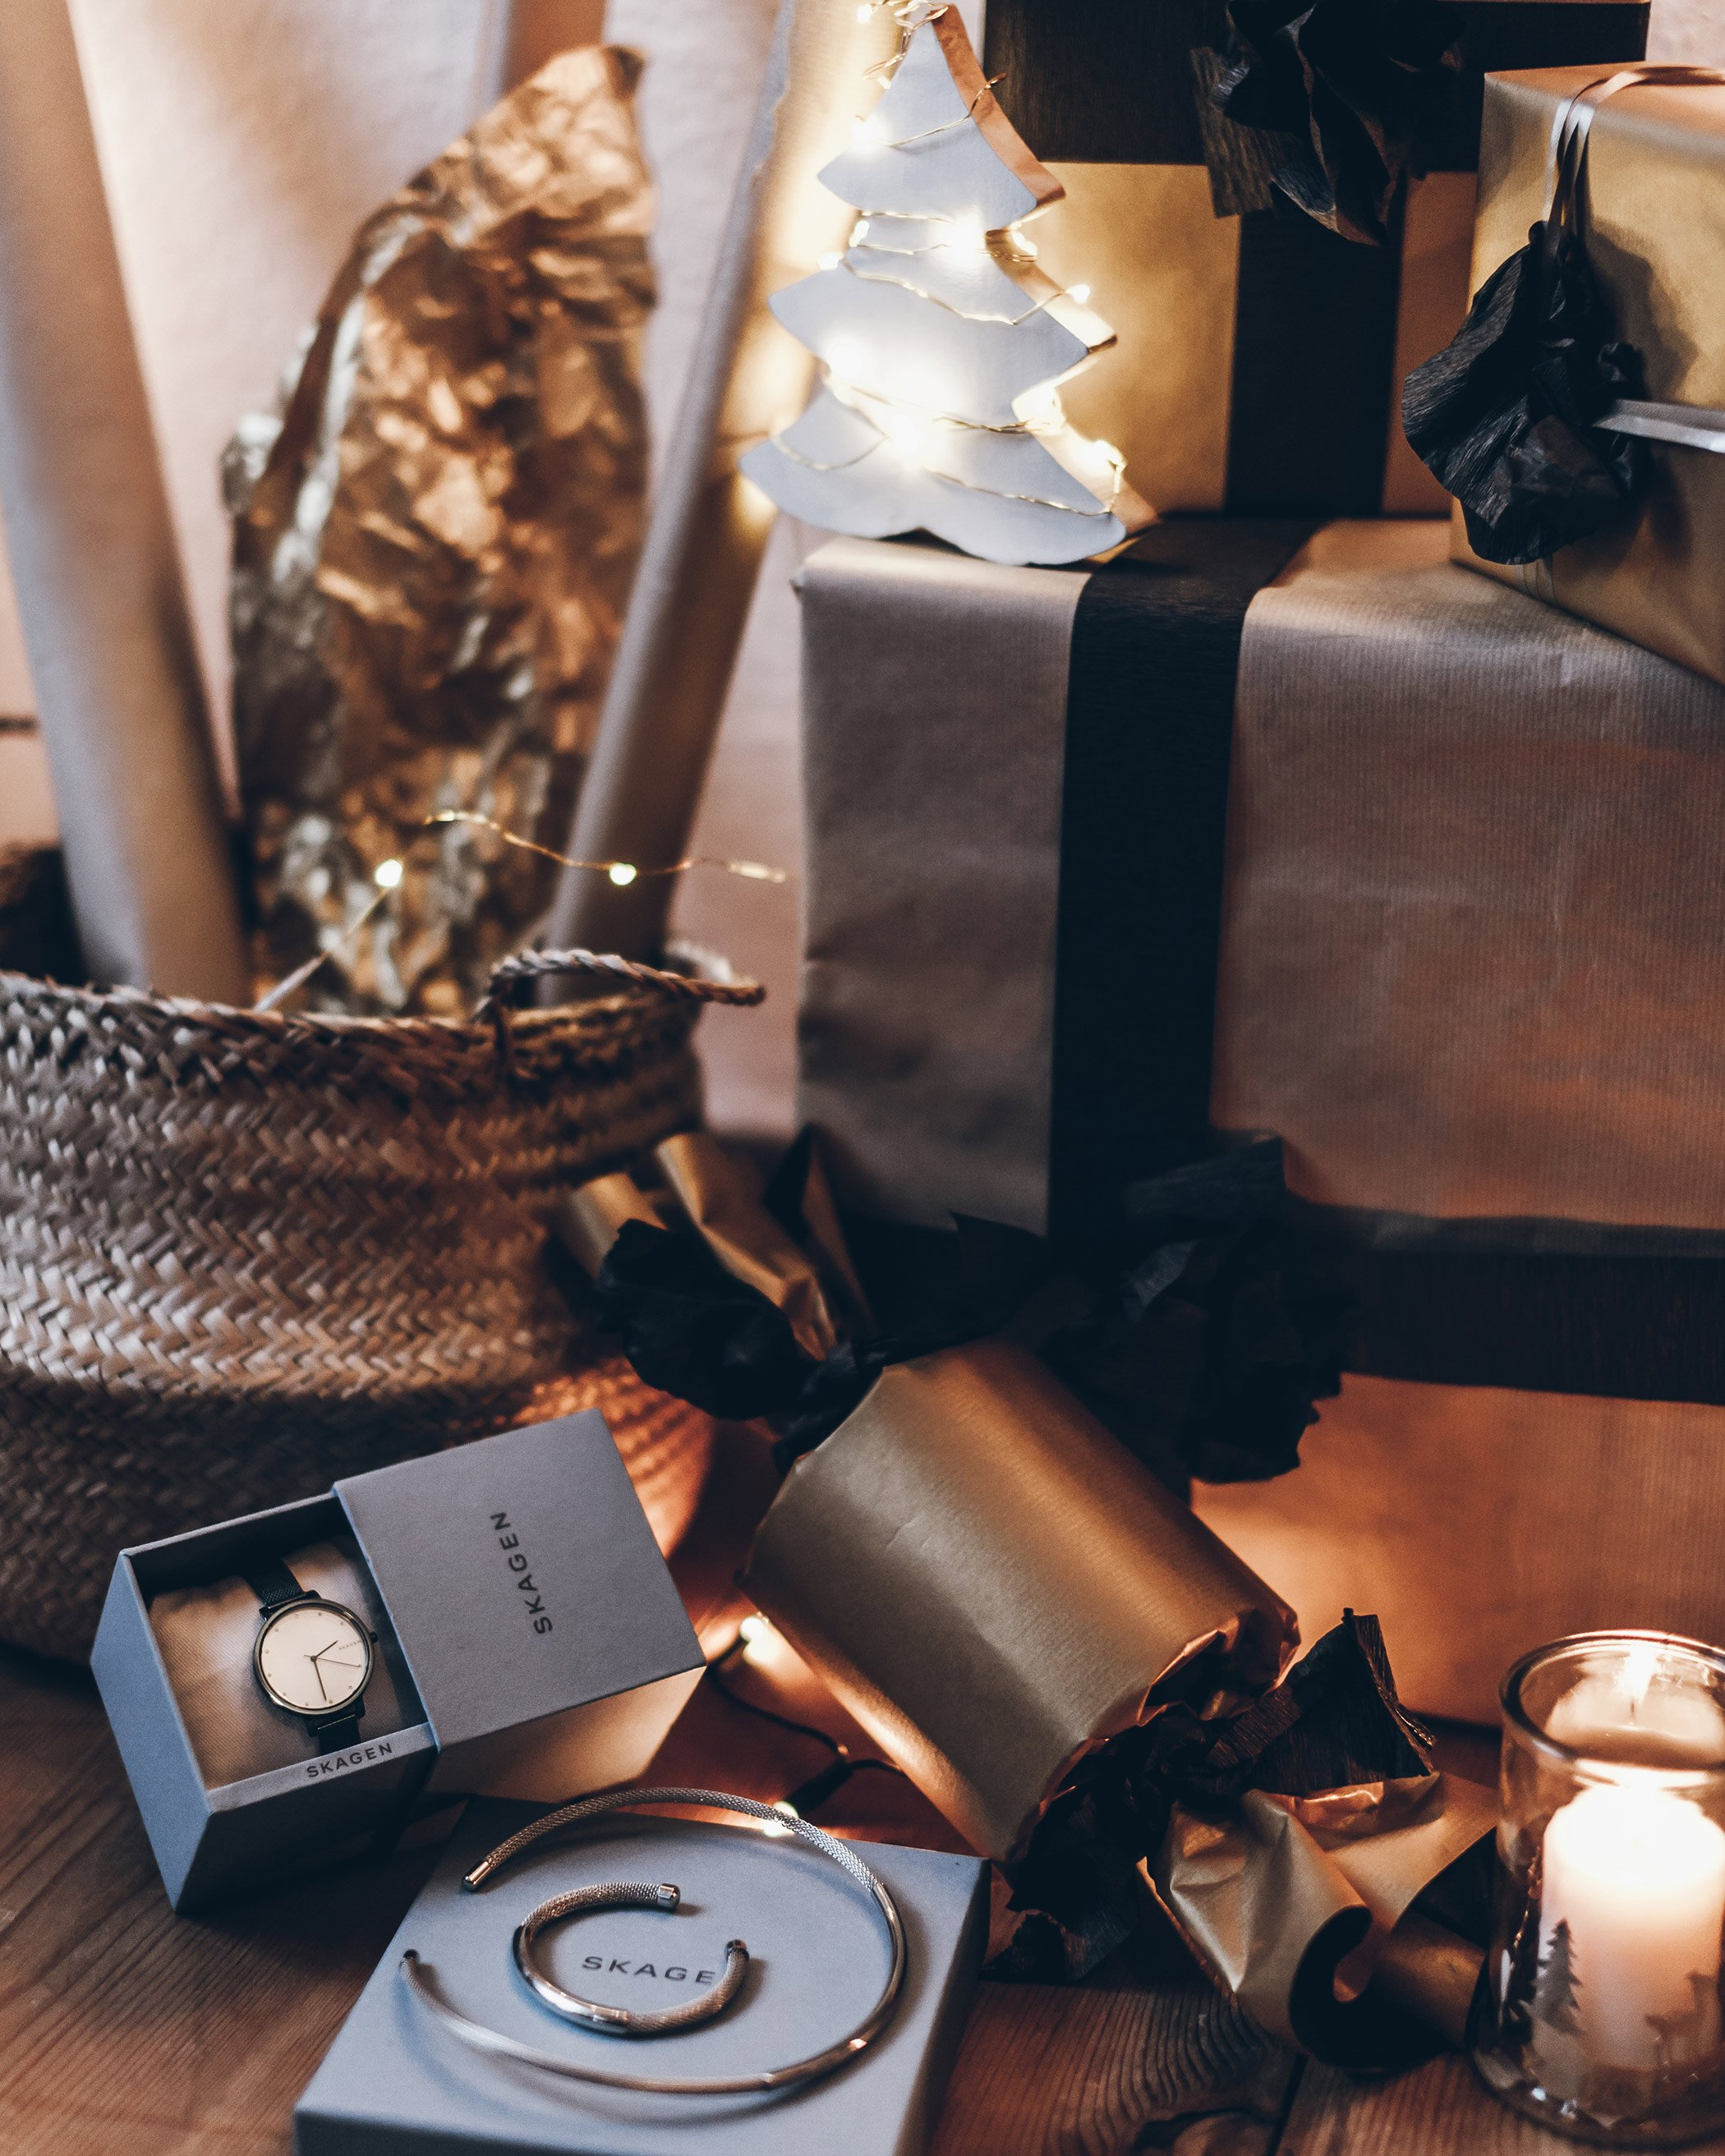 mikuta-skagen-gifting-guide-8